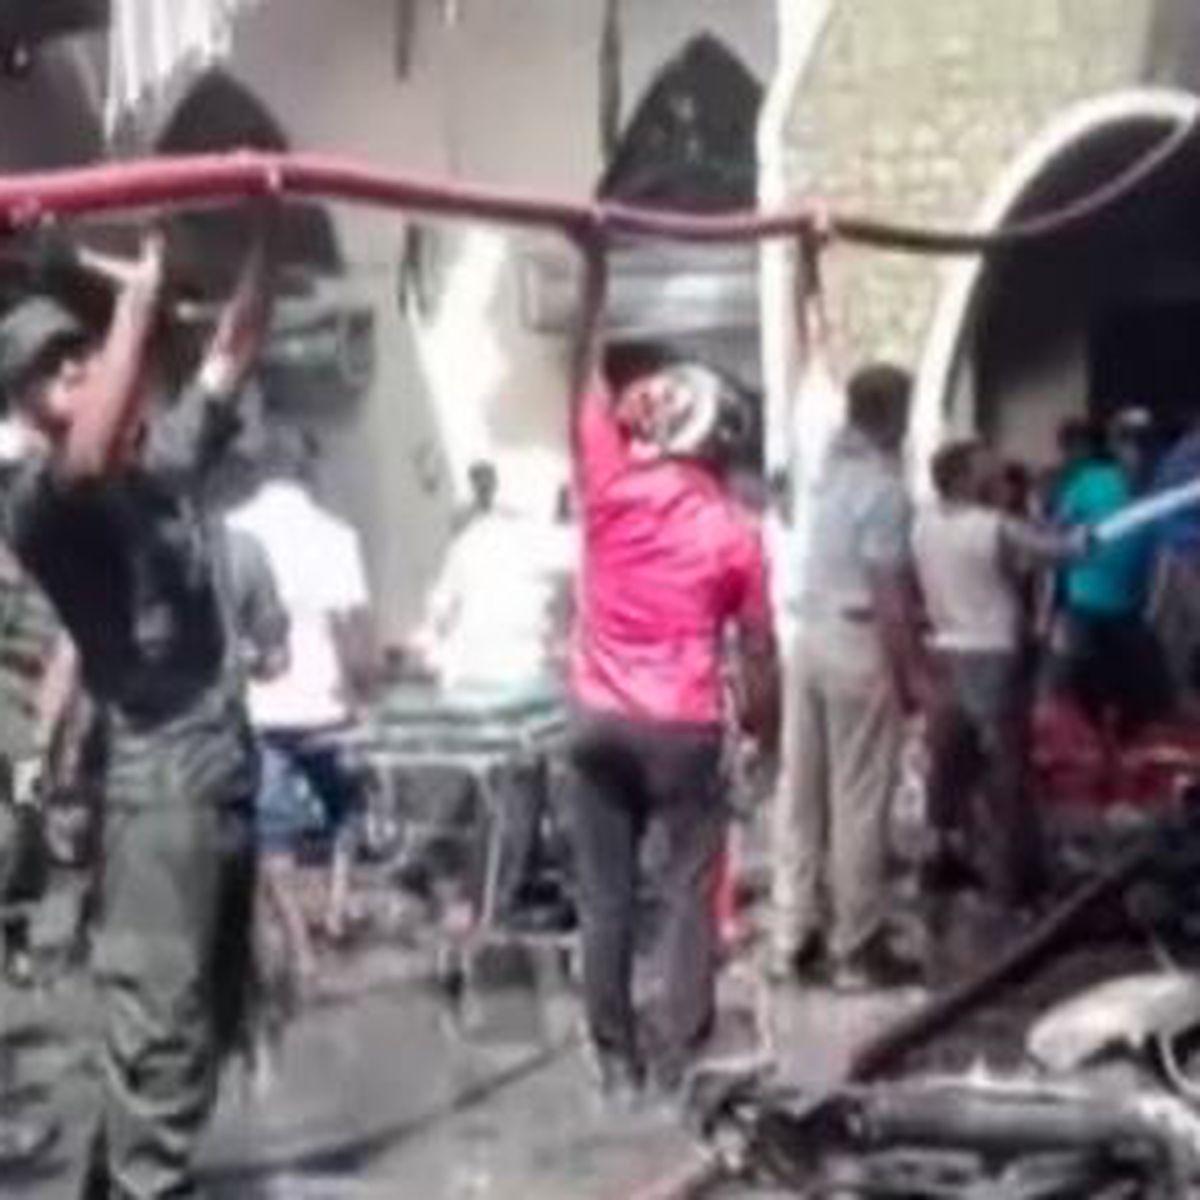 Van explodes near bombed Sri Lanka church